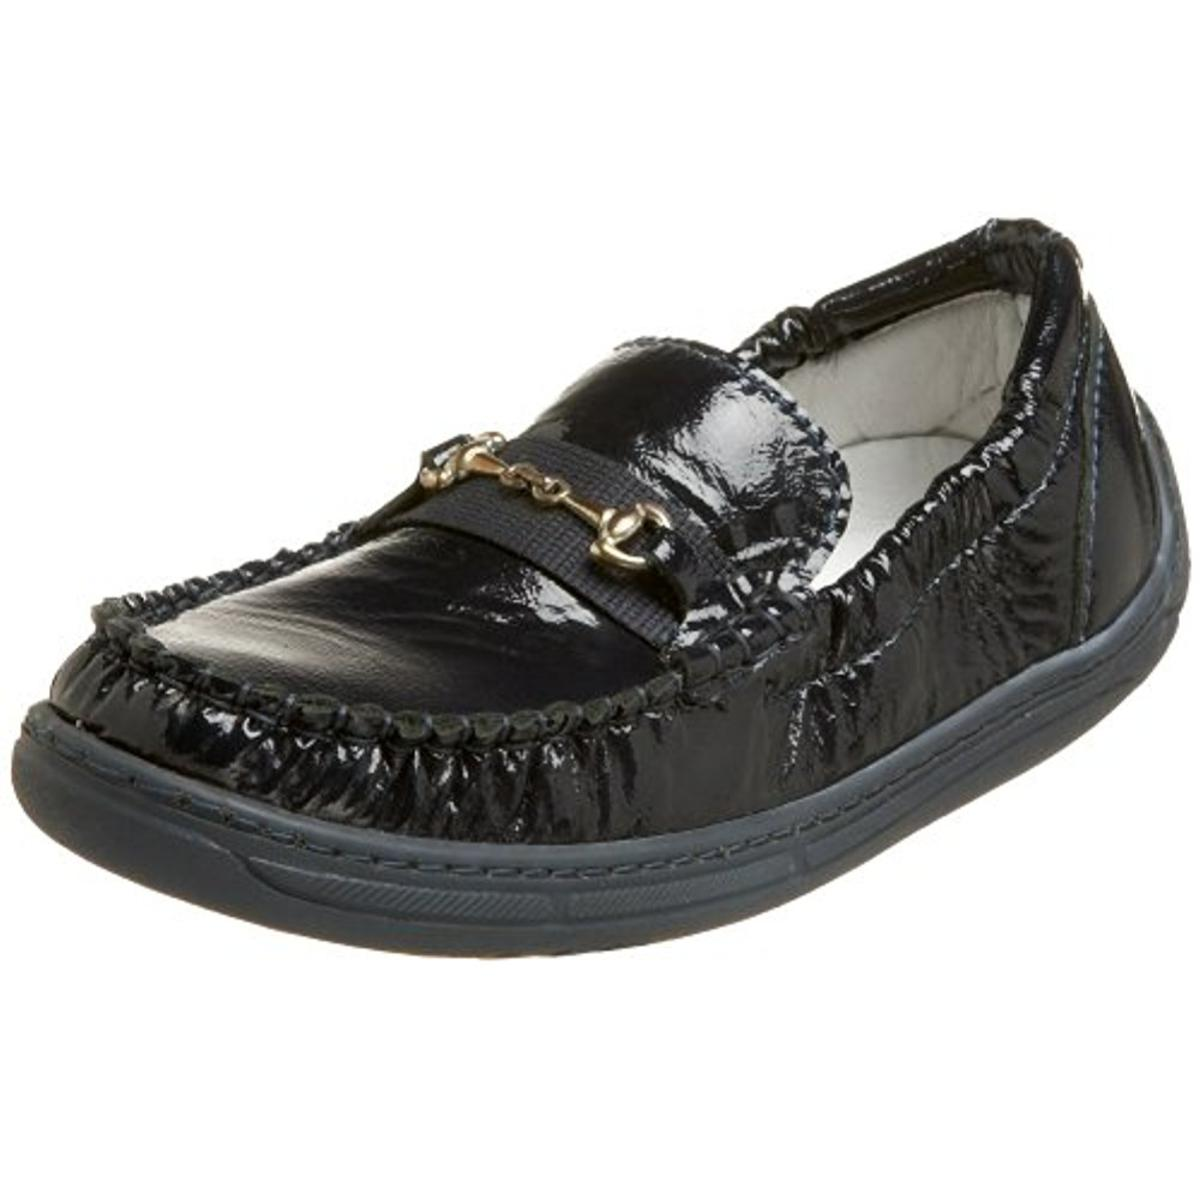 Primigi Izzy Lightweight Leather Loafers by Primigi